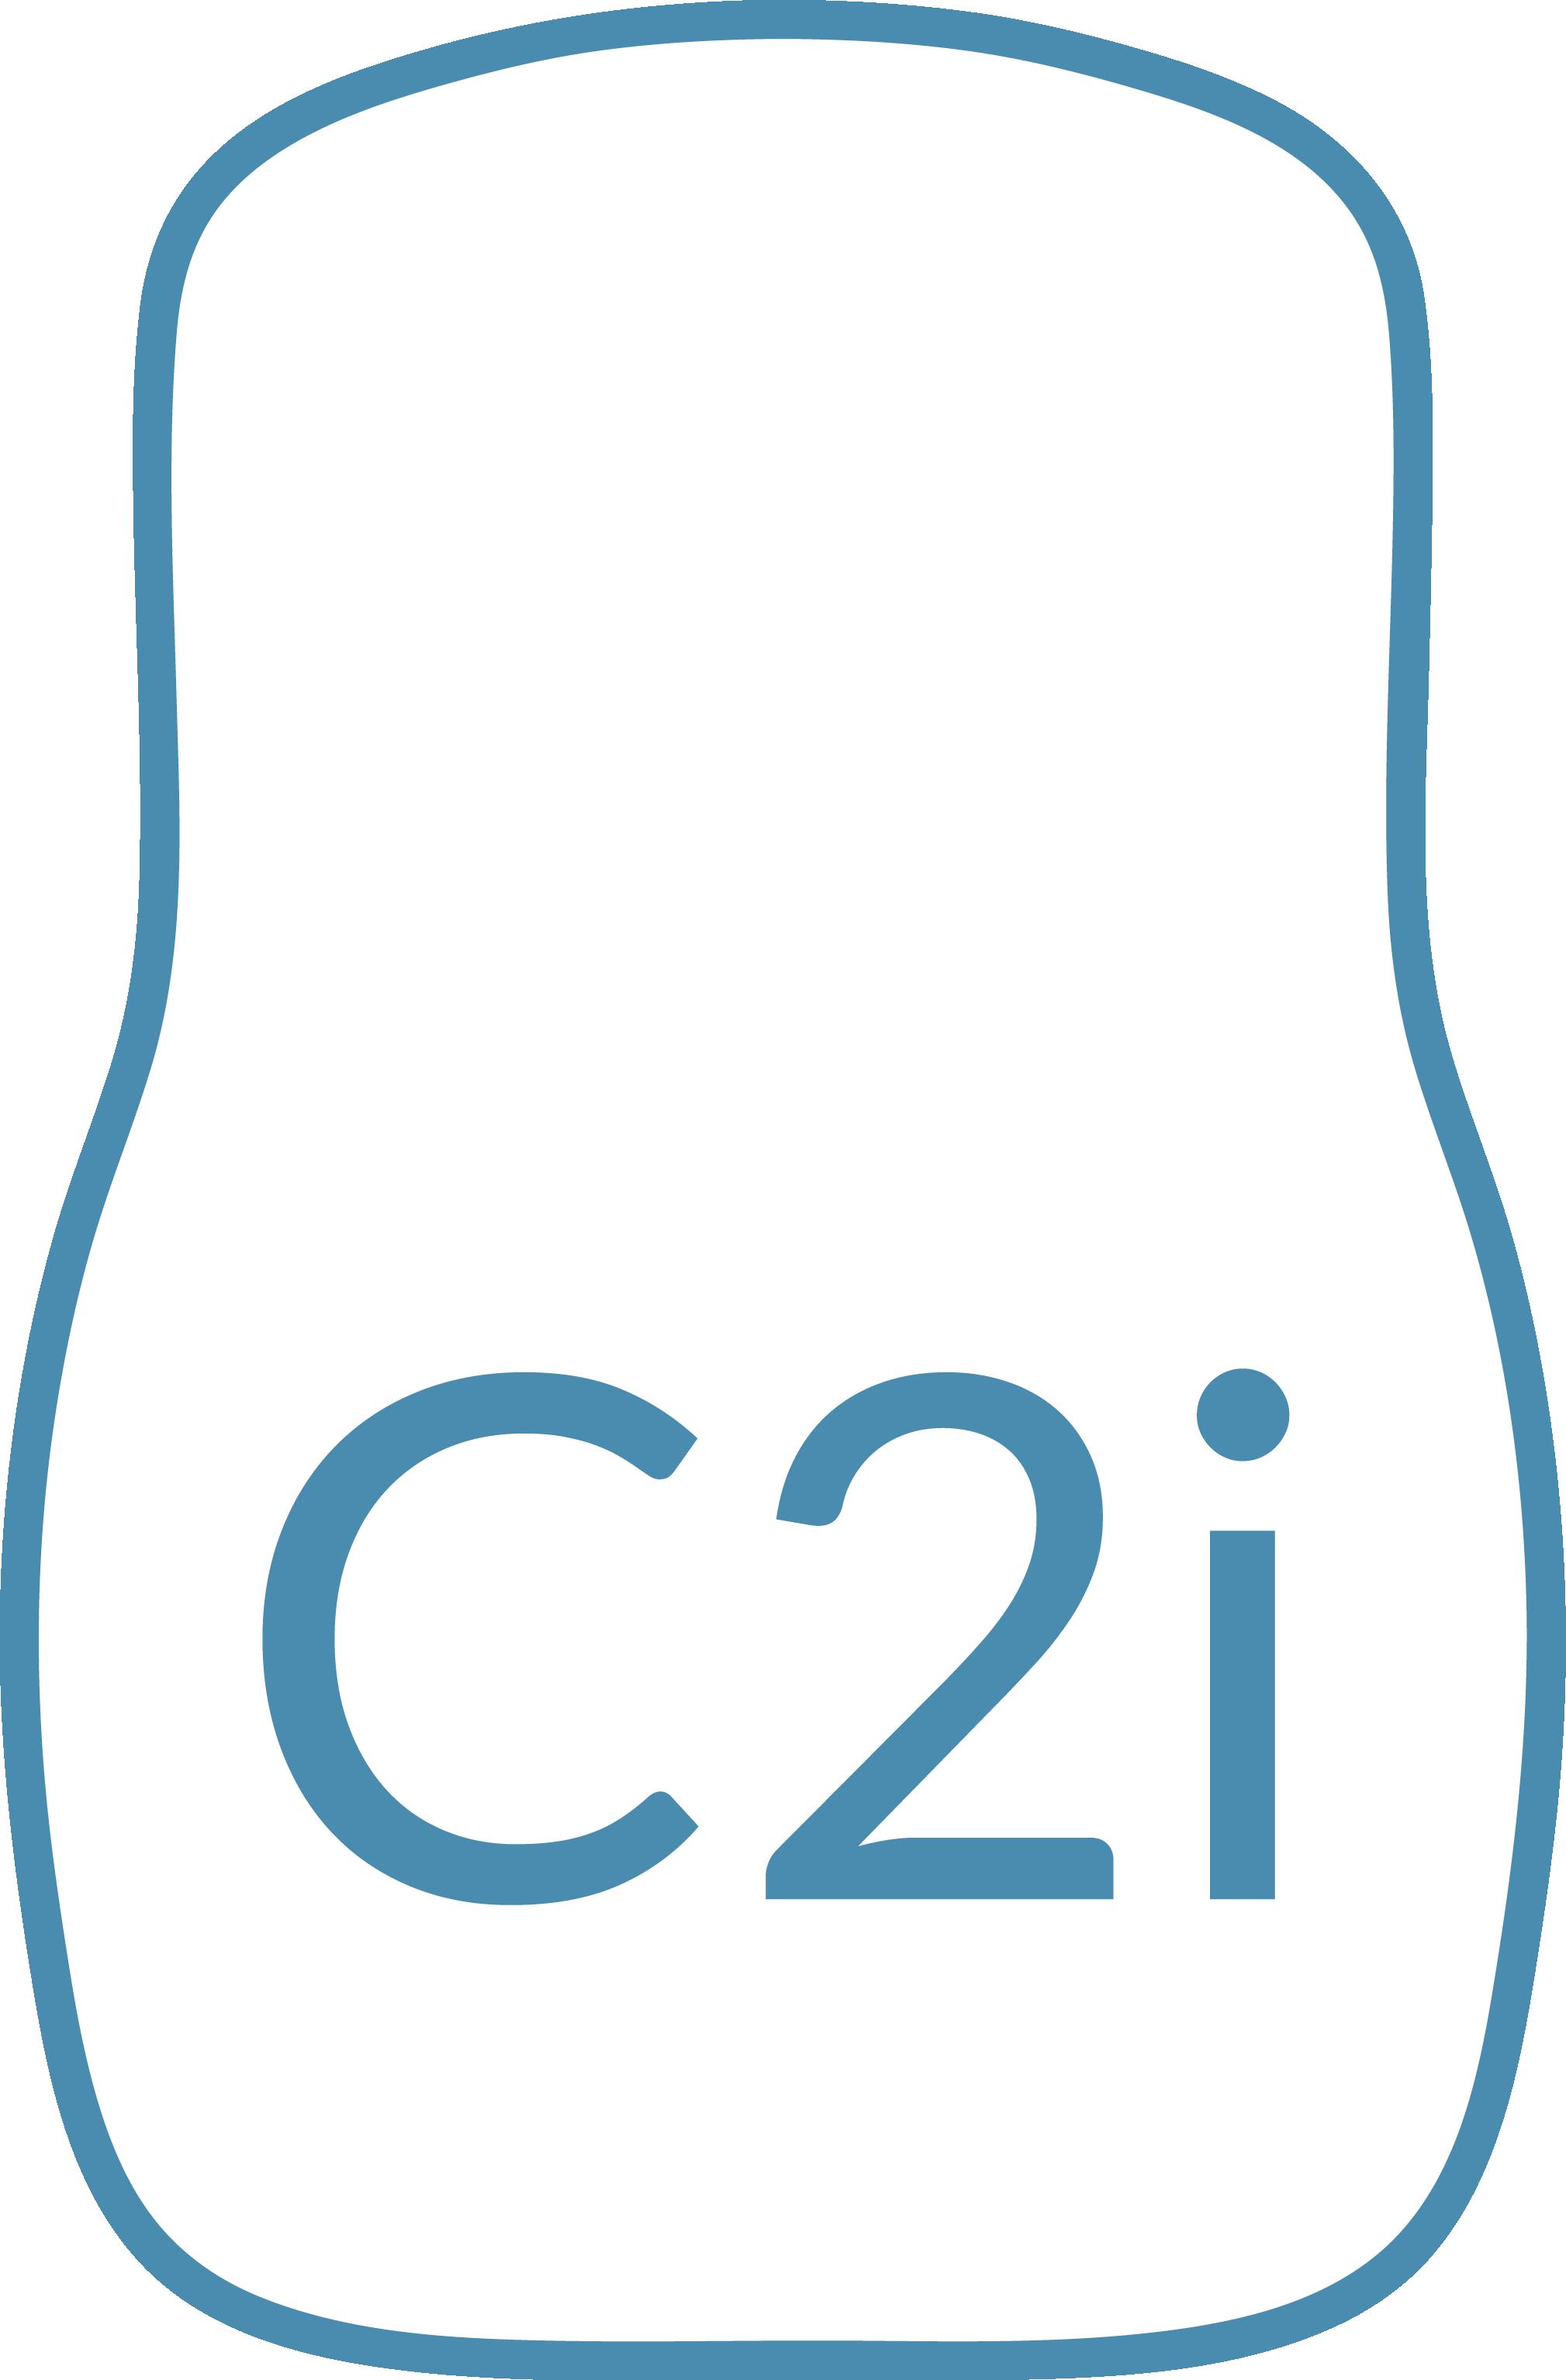 C2i Logo 2